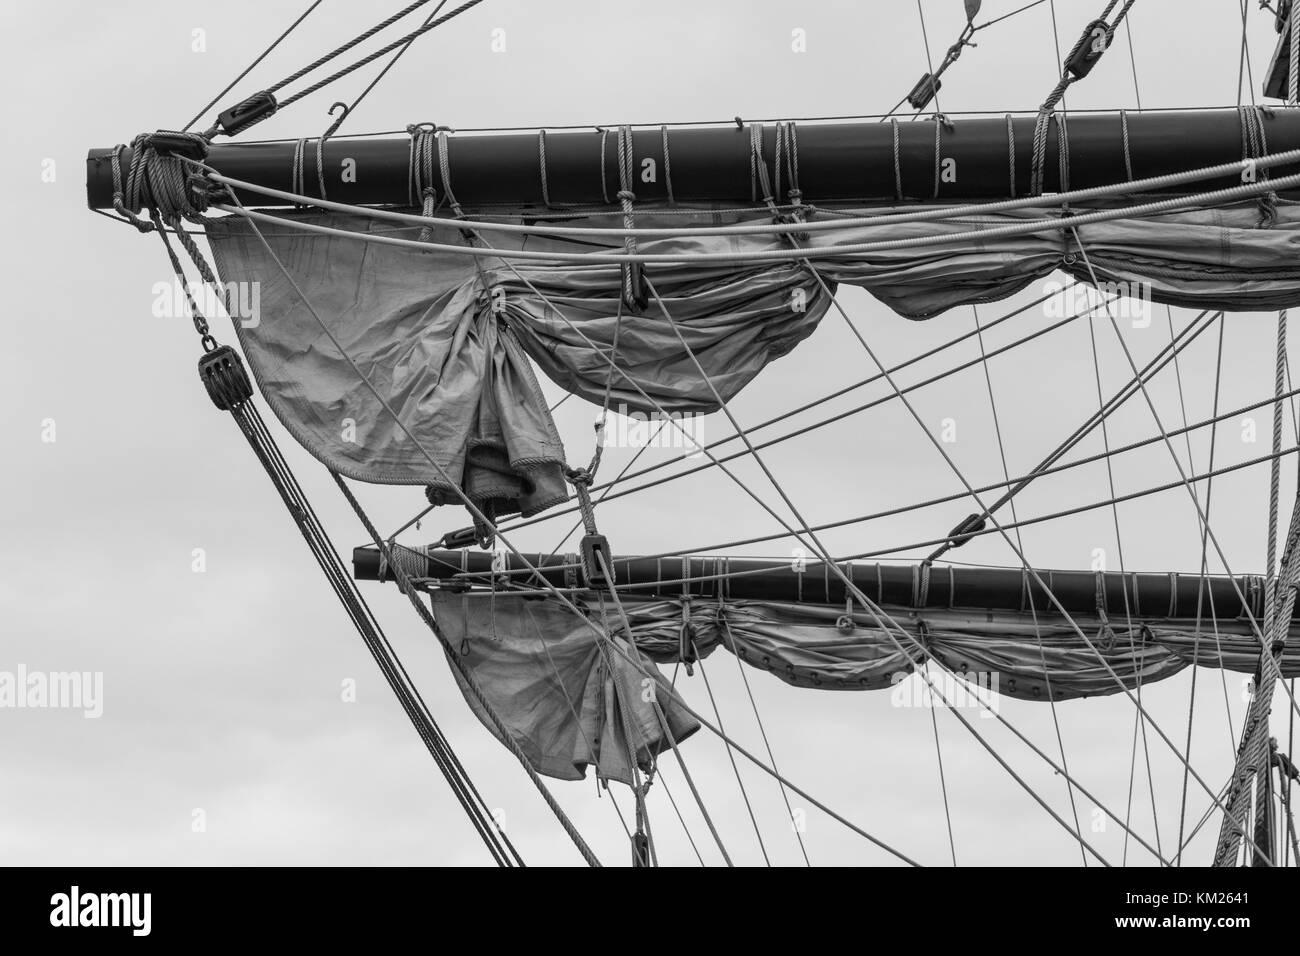 Tall Ship El Galeon Andalusia in Halifax, Nova Scotia, Canada. - Stock Image